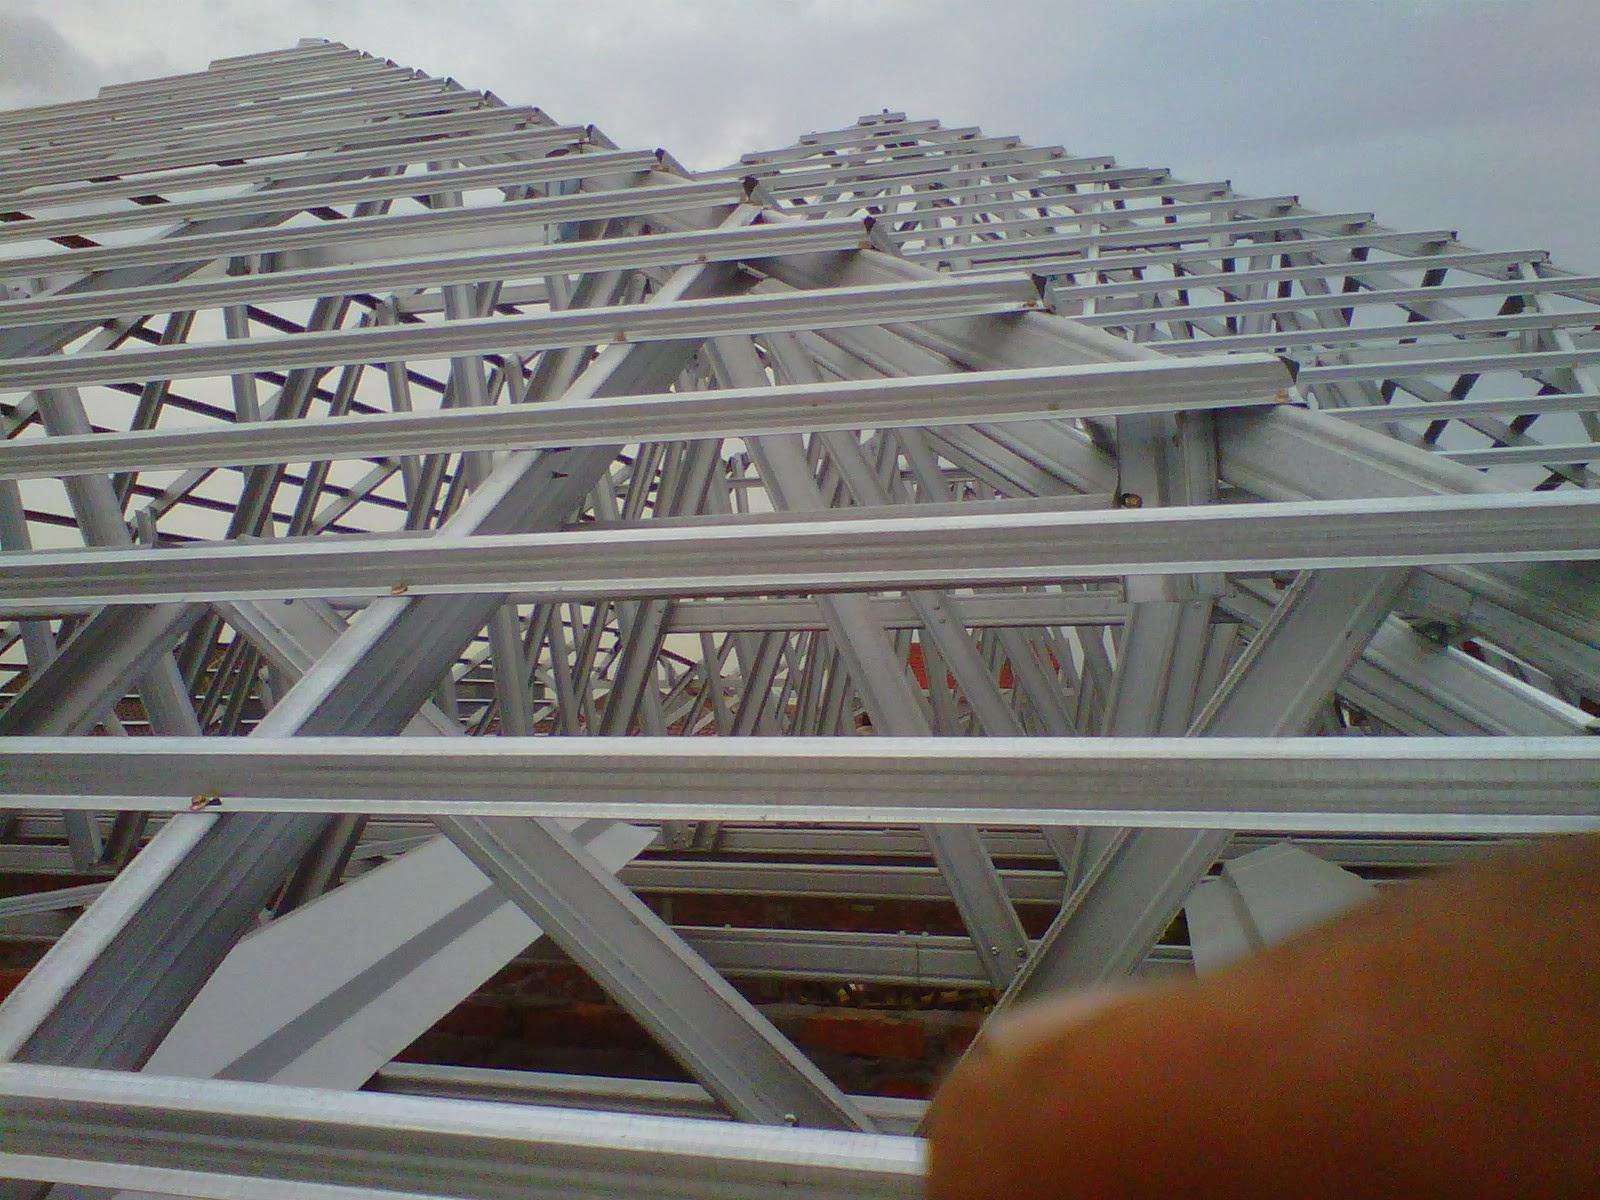 kanopi baja ringan pontianak proyek deltasari raya sidoarjo – distributor galvalum ...